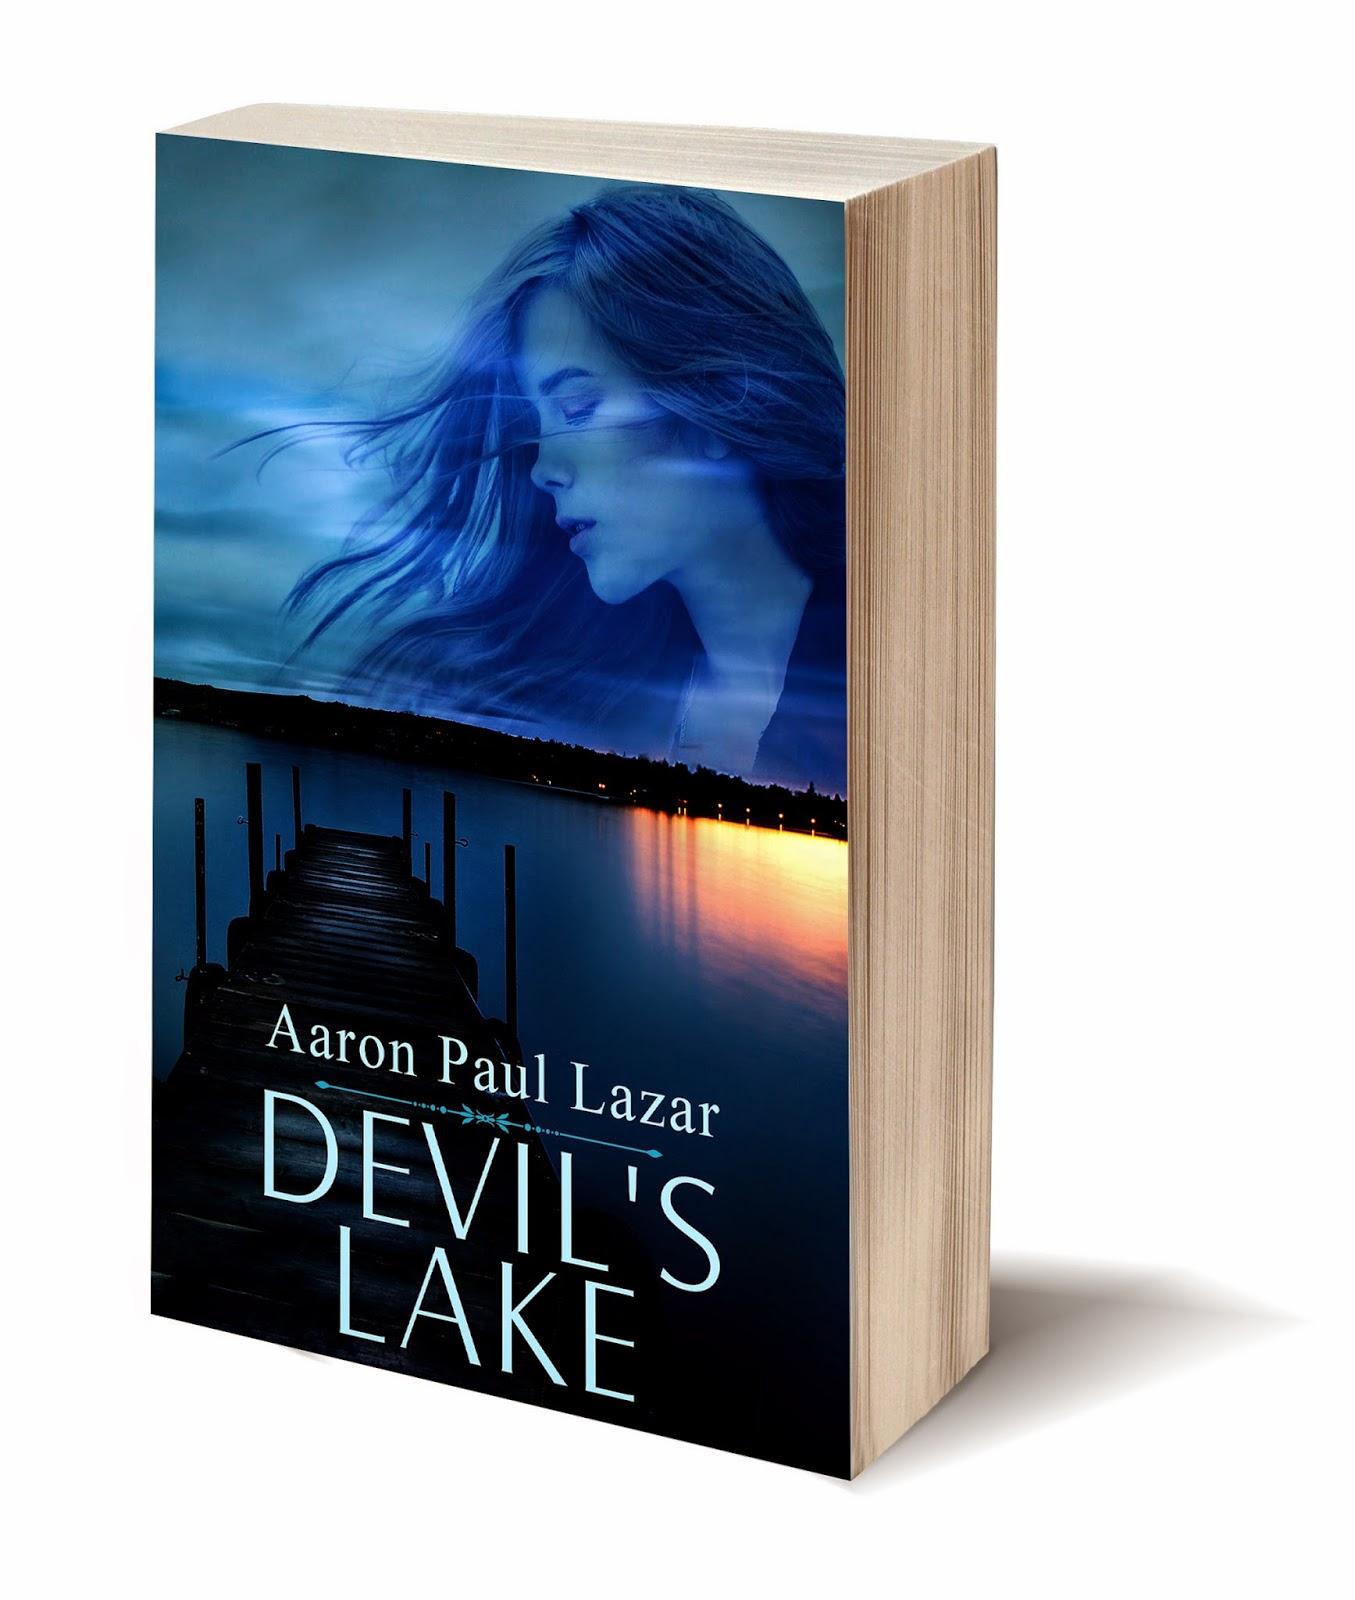 http://www.amazon.com/Devils-Lake-Aaron-Paul-Lazar-ebook/dp/B00LNFP8XU/ref=pd_sim_kstore_1?ie=UTF8&refRID=08N23T8CKMDQKK7TEDHJ